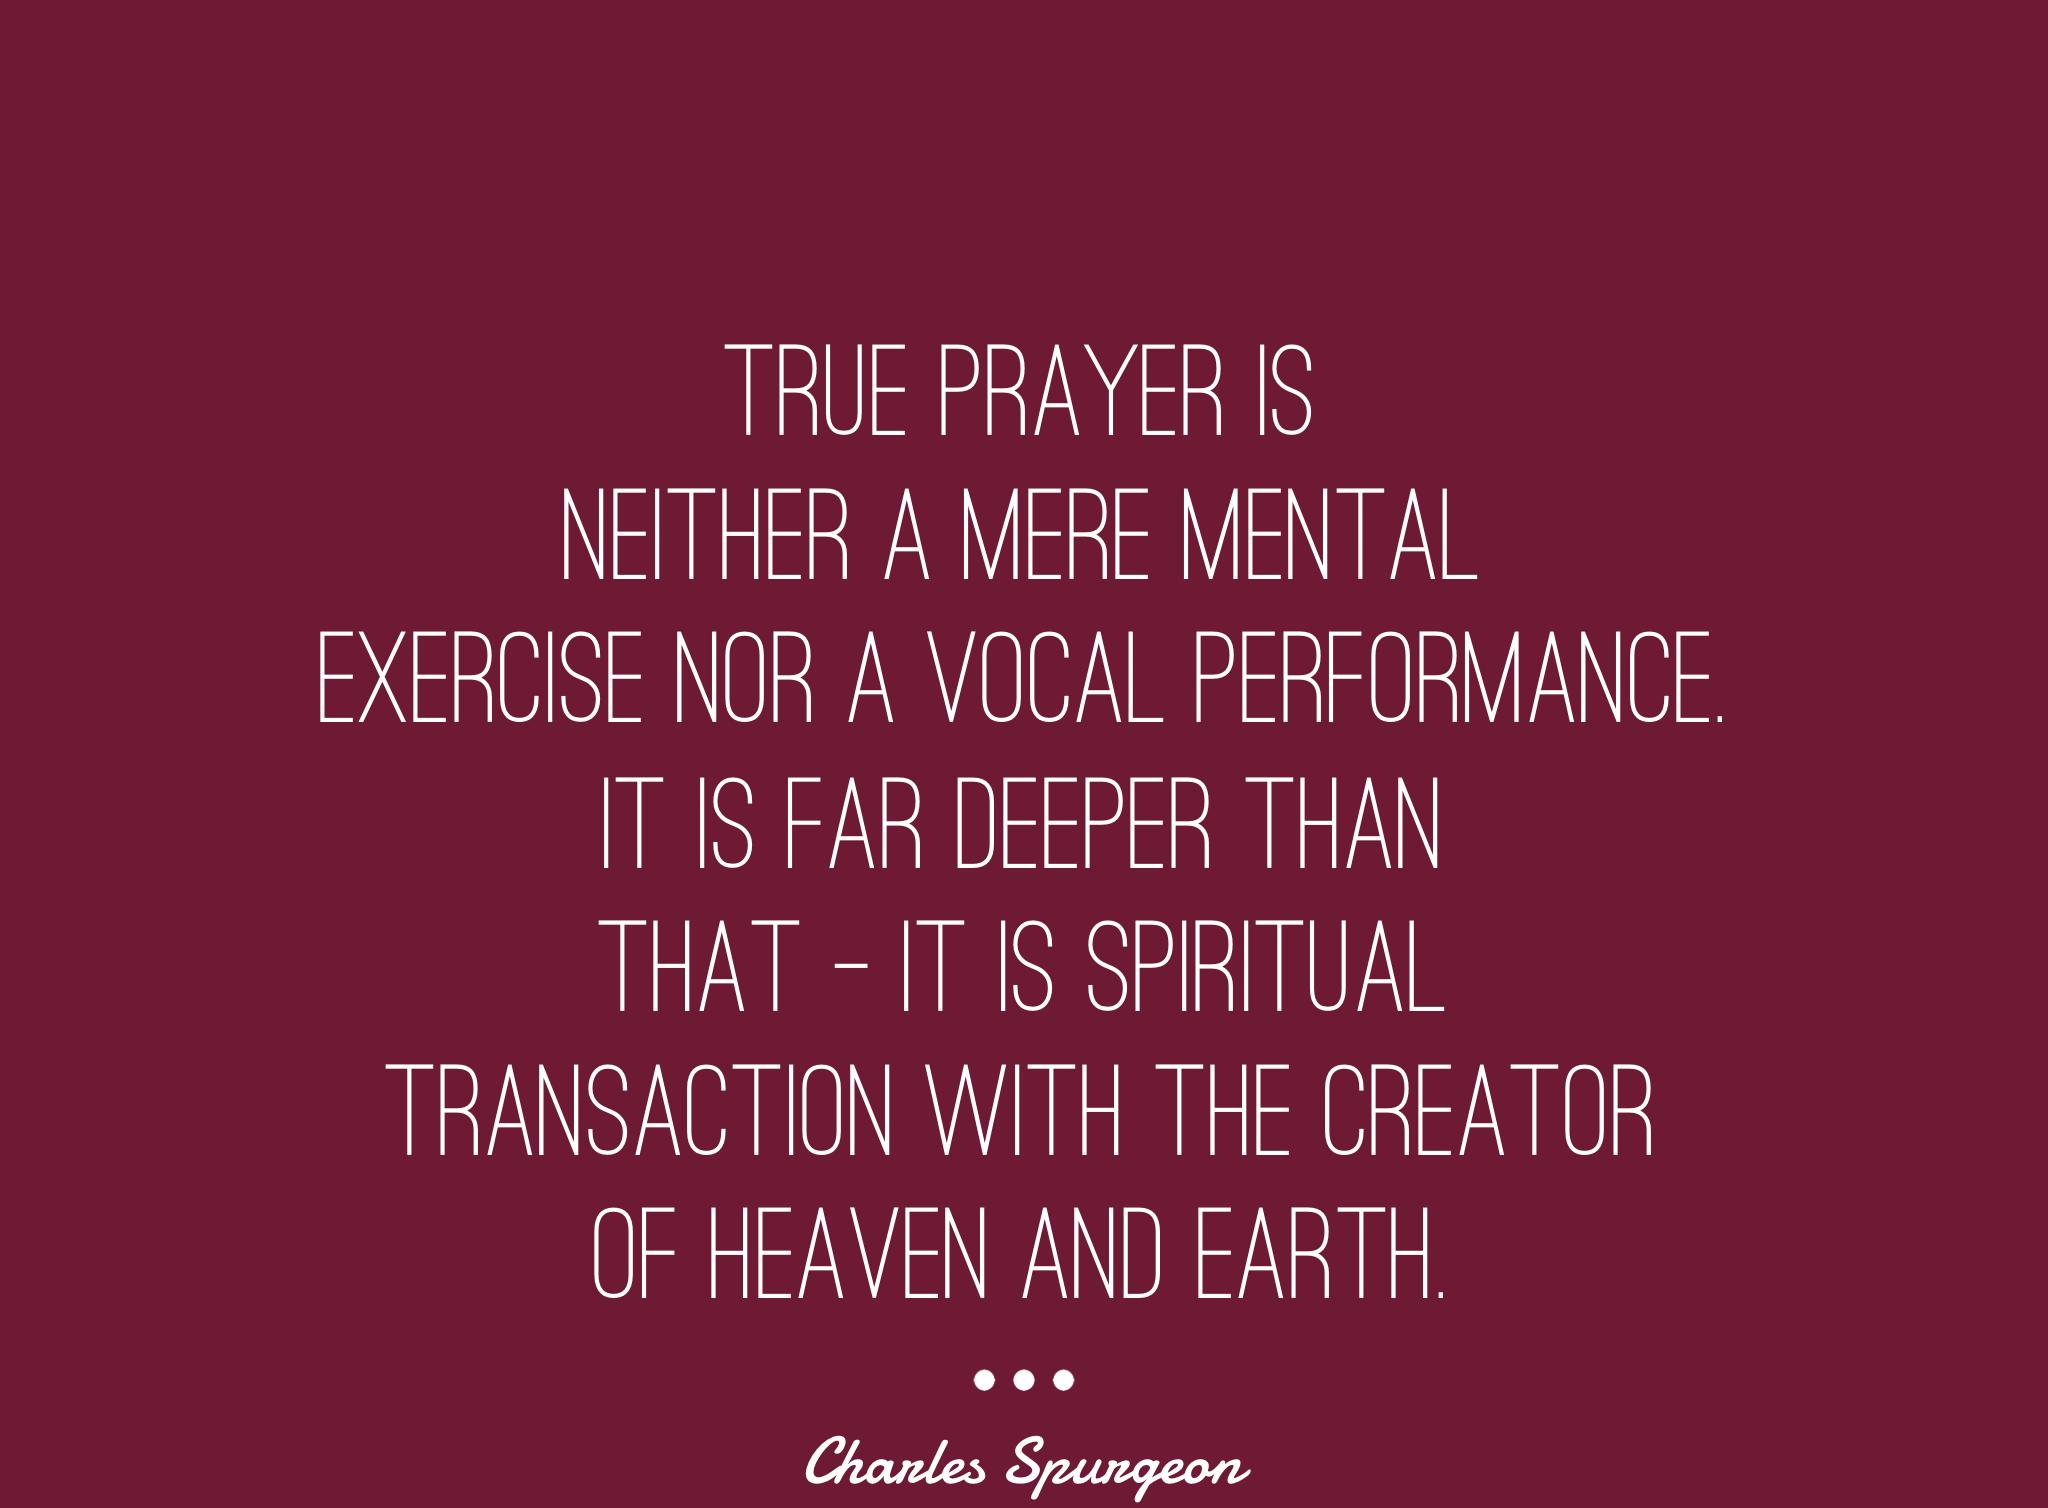 Prayer-Charles-Spurgeon